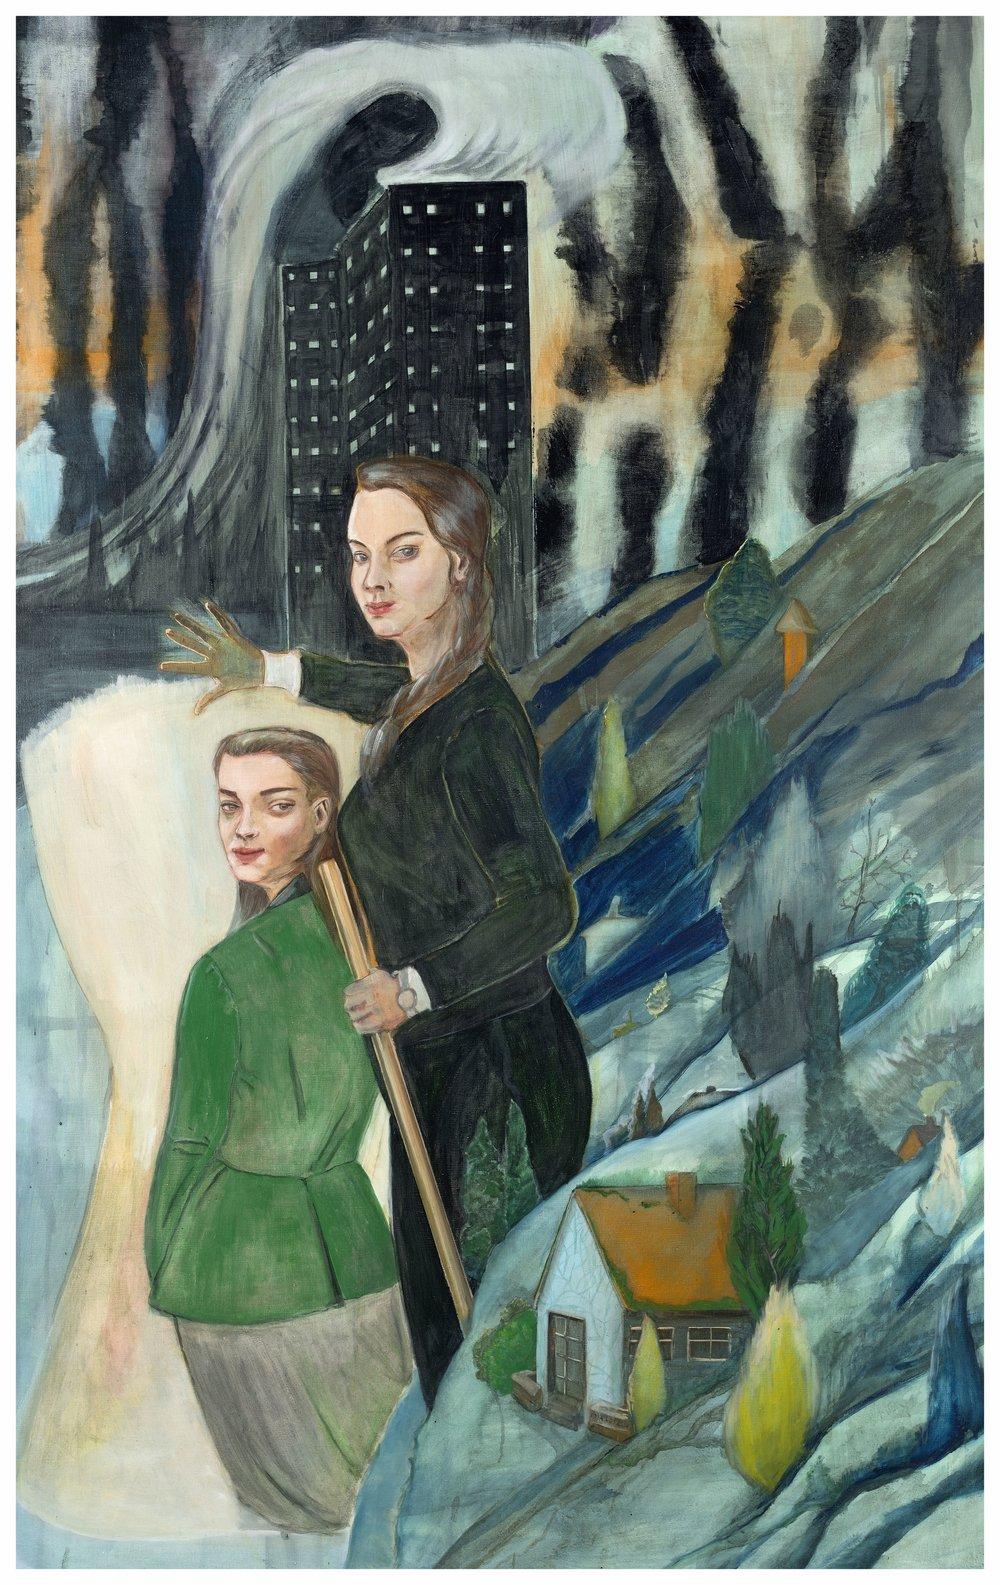 """Tide,"" 2014, casein on canvas, 75 3/4 x 43 1/4 inches"